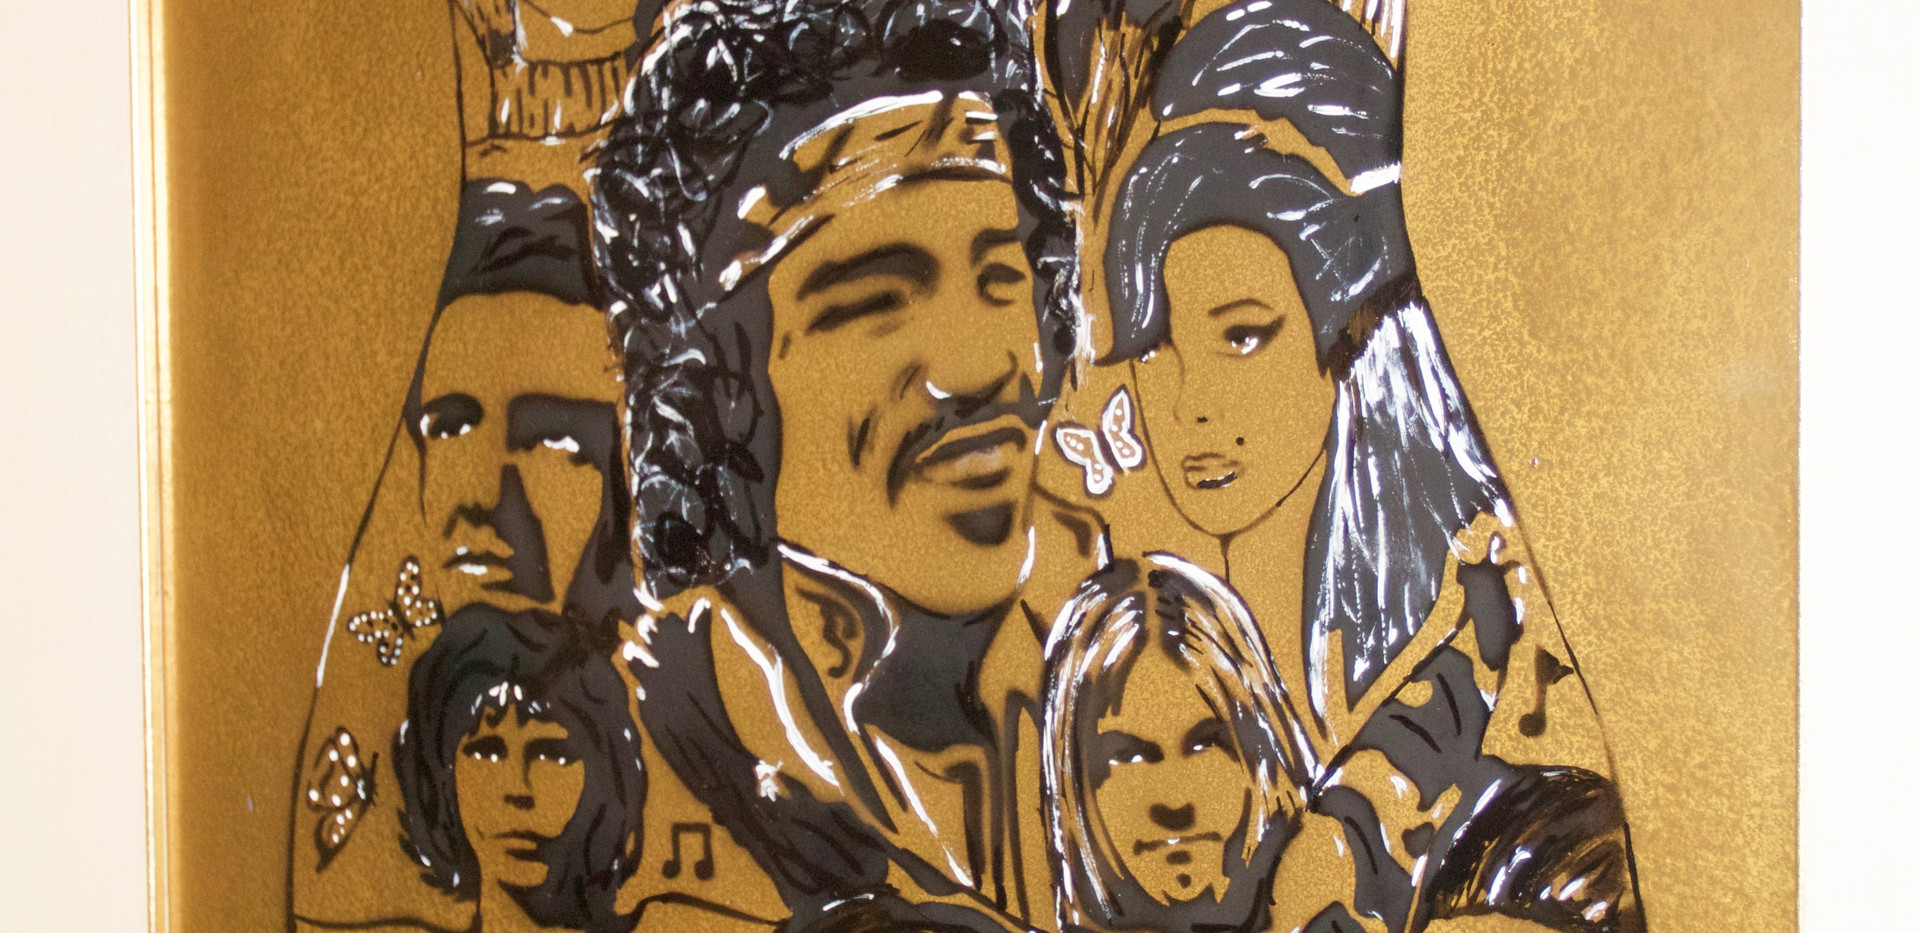 Artistas Muertos. Stencil on Paper.